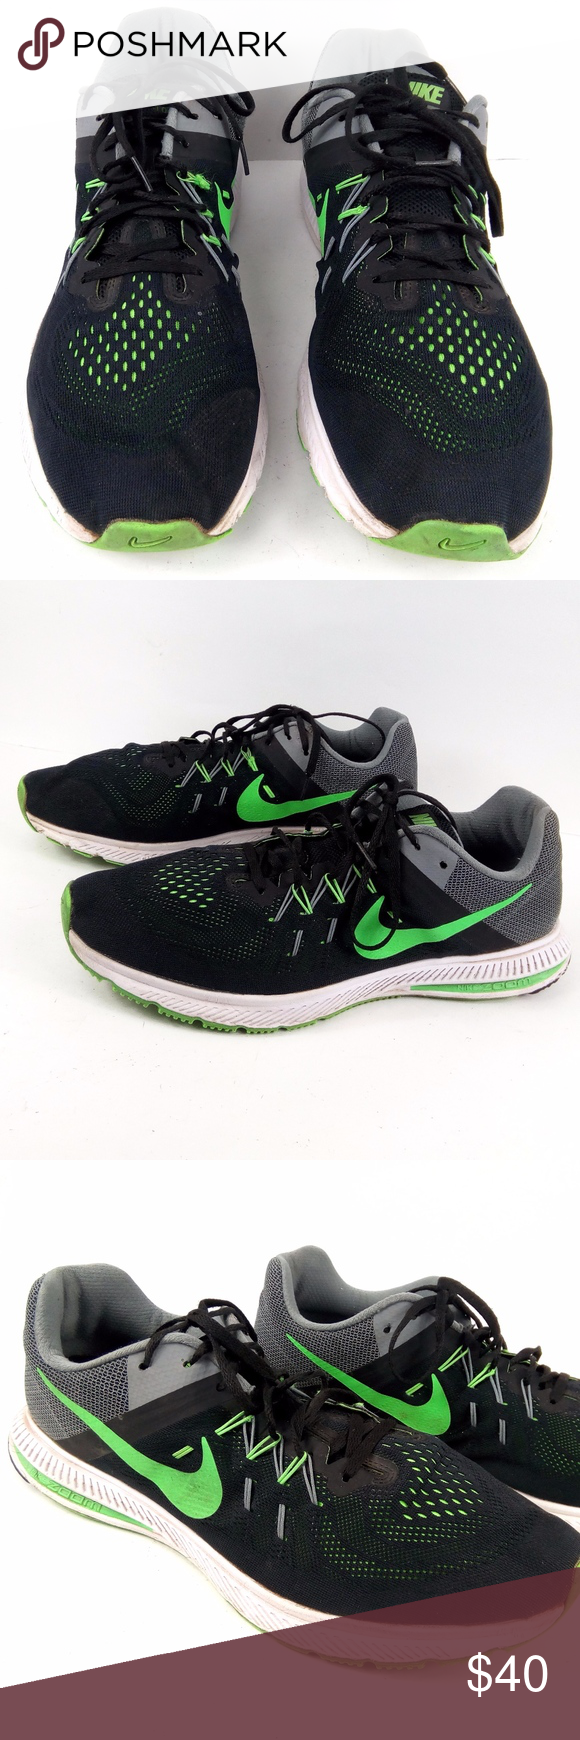 42++ Black nike running shoes ideas information